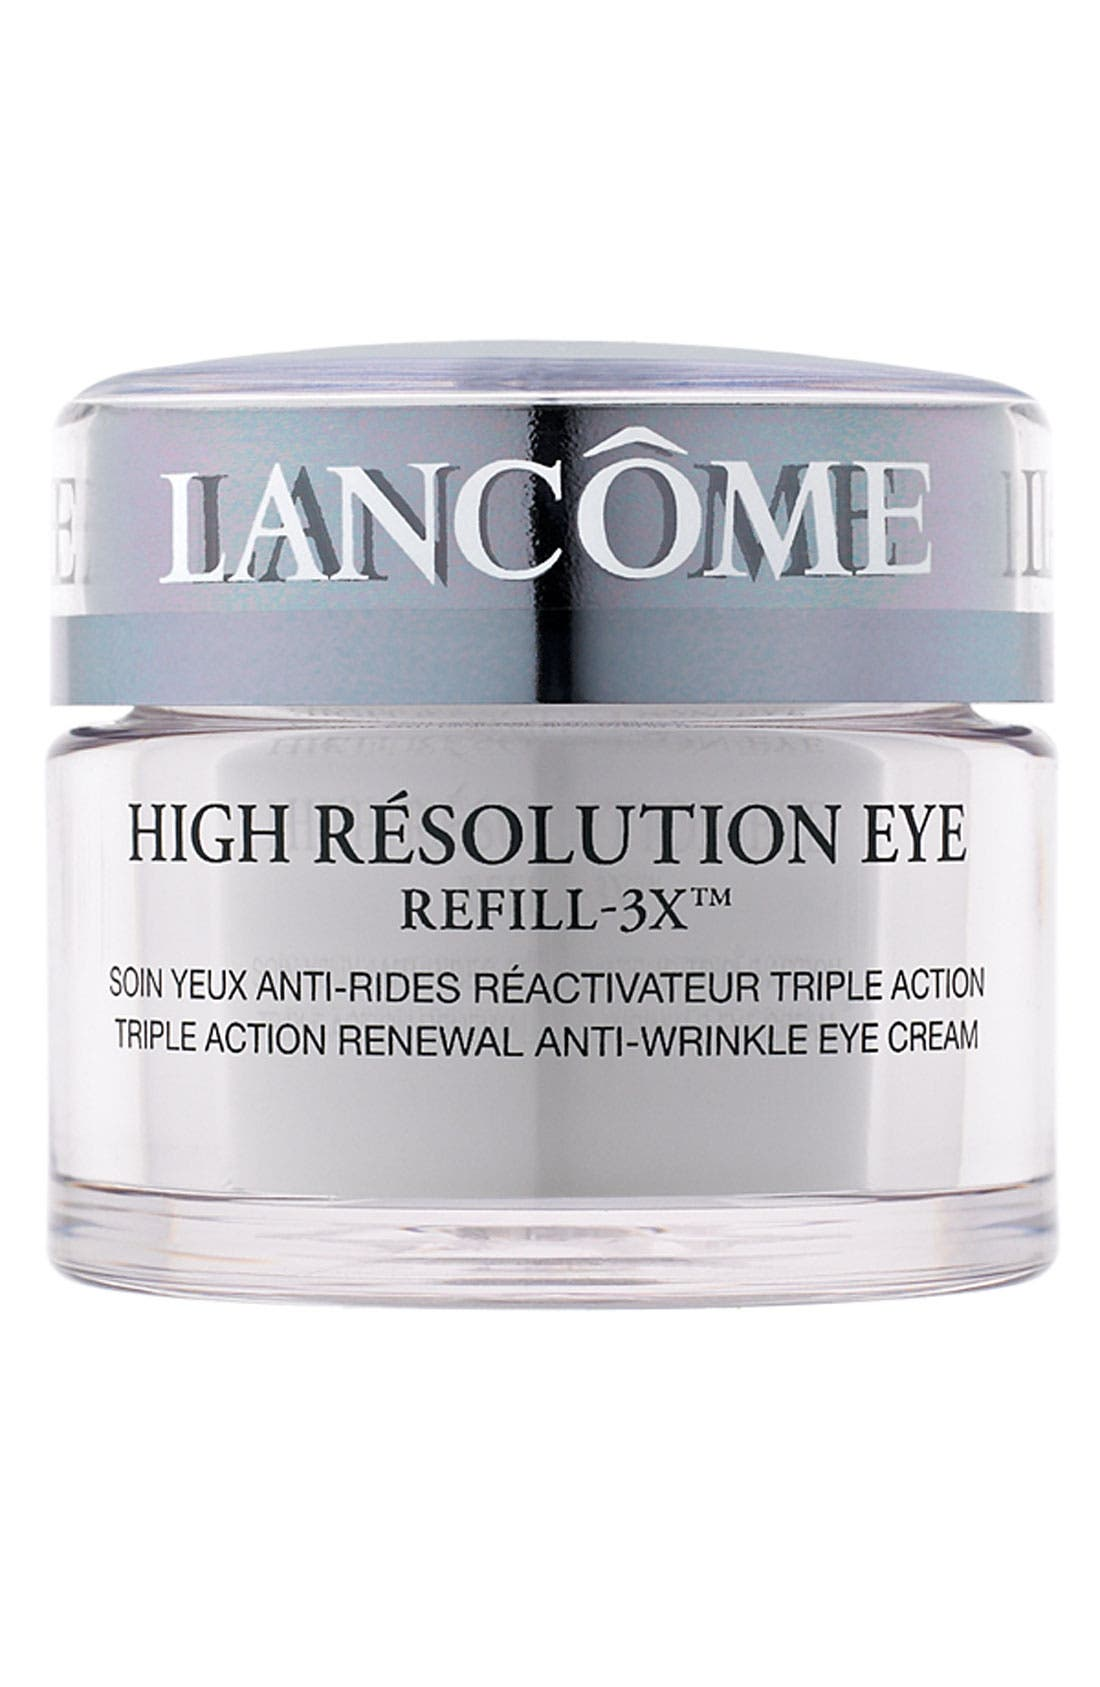 Lancôme High Résolution Refill-3X Anti-Wrinkle Eye Cream